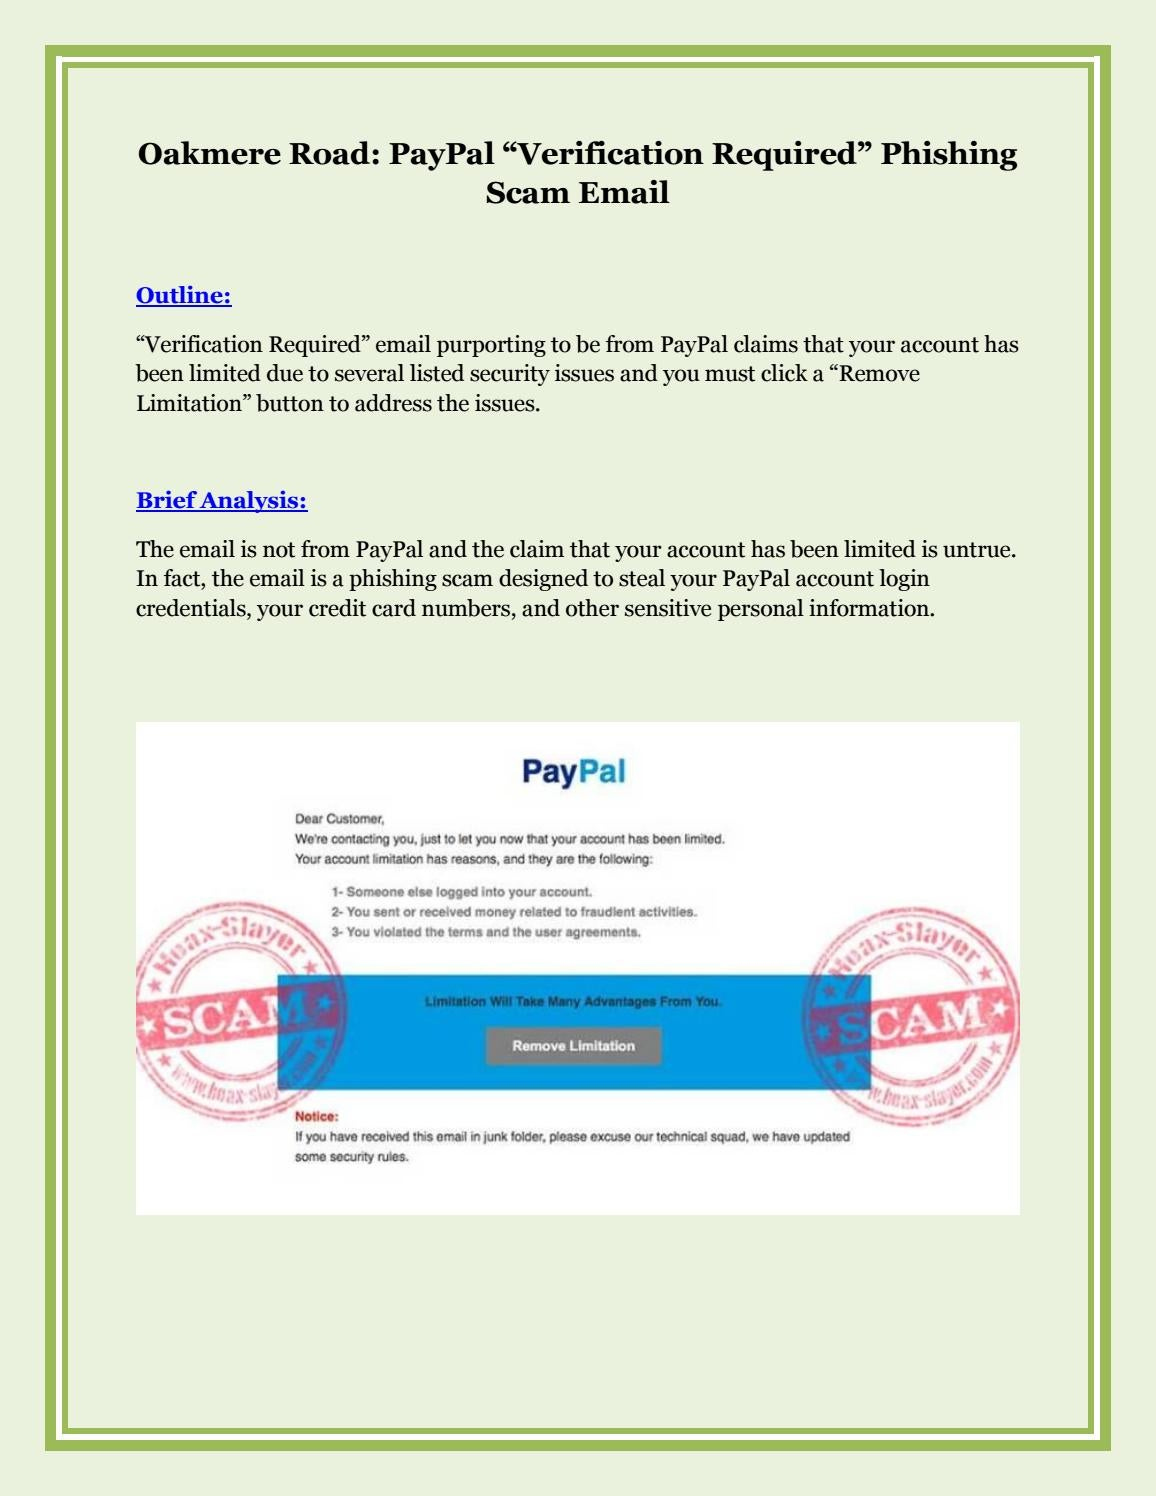 Email Paypal Verifikation